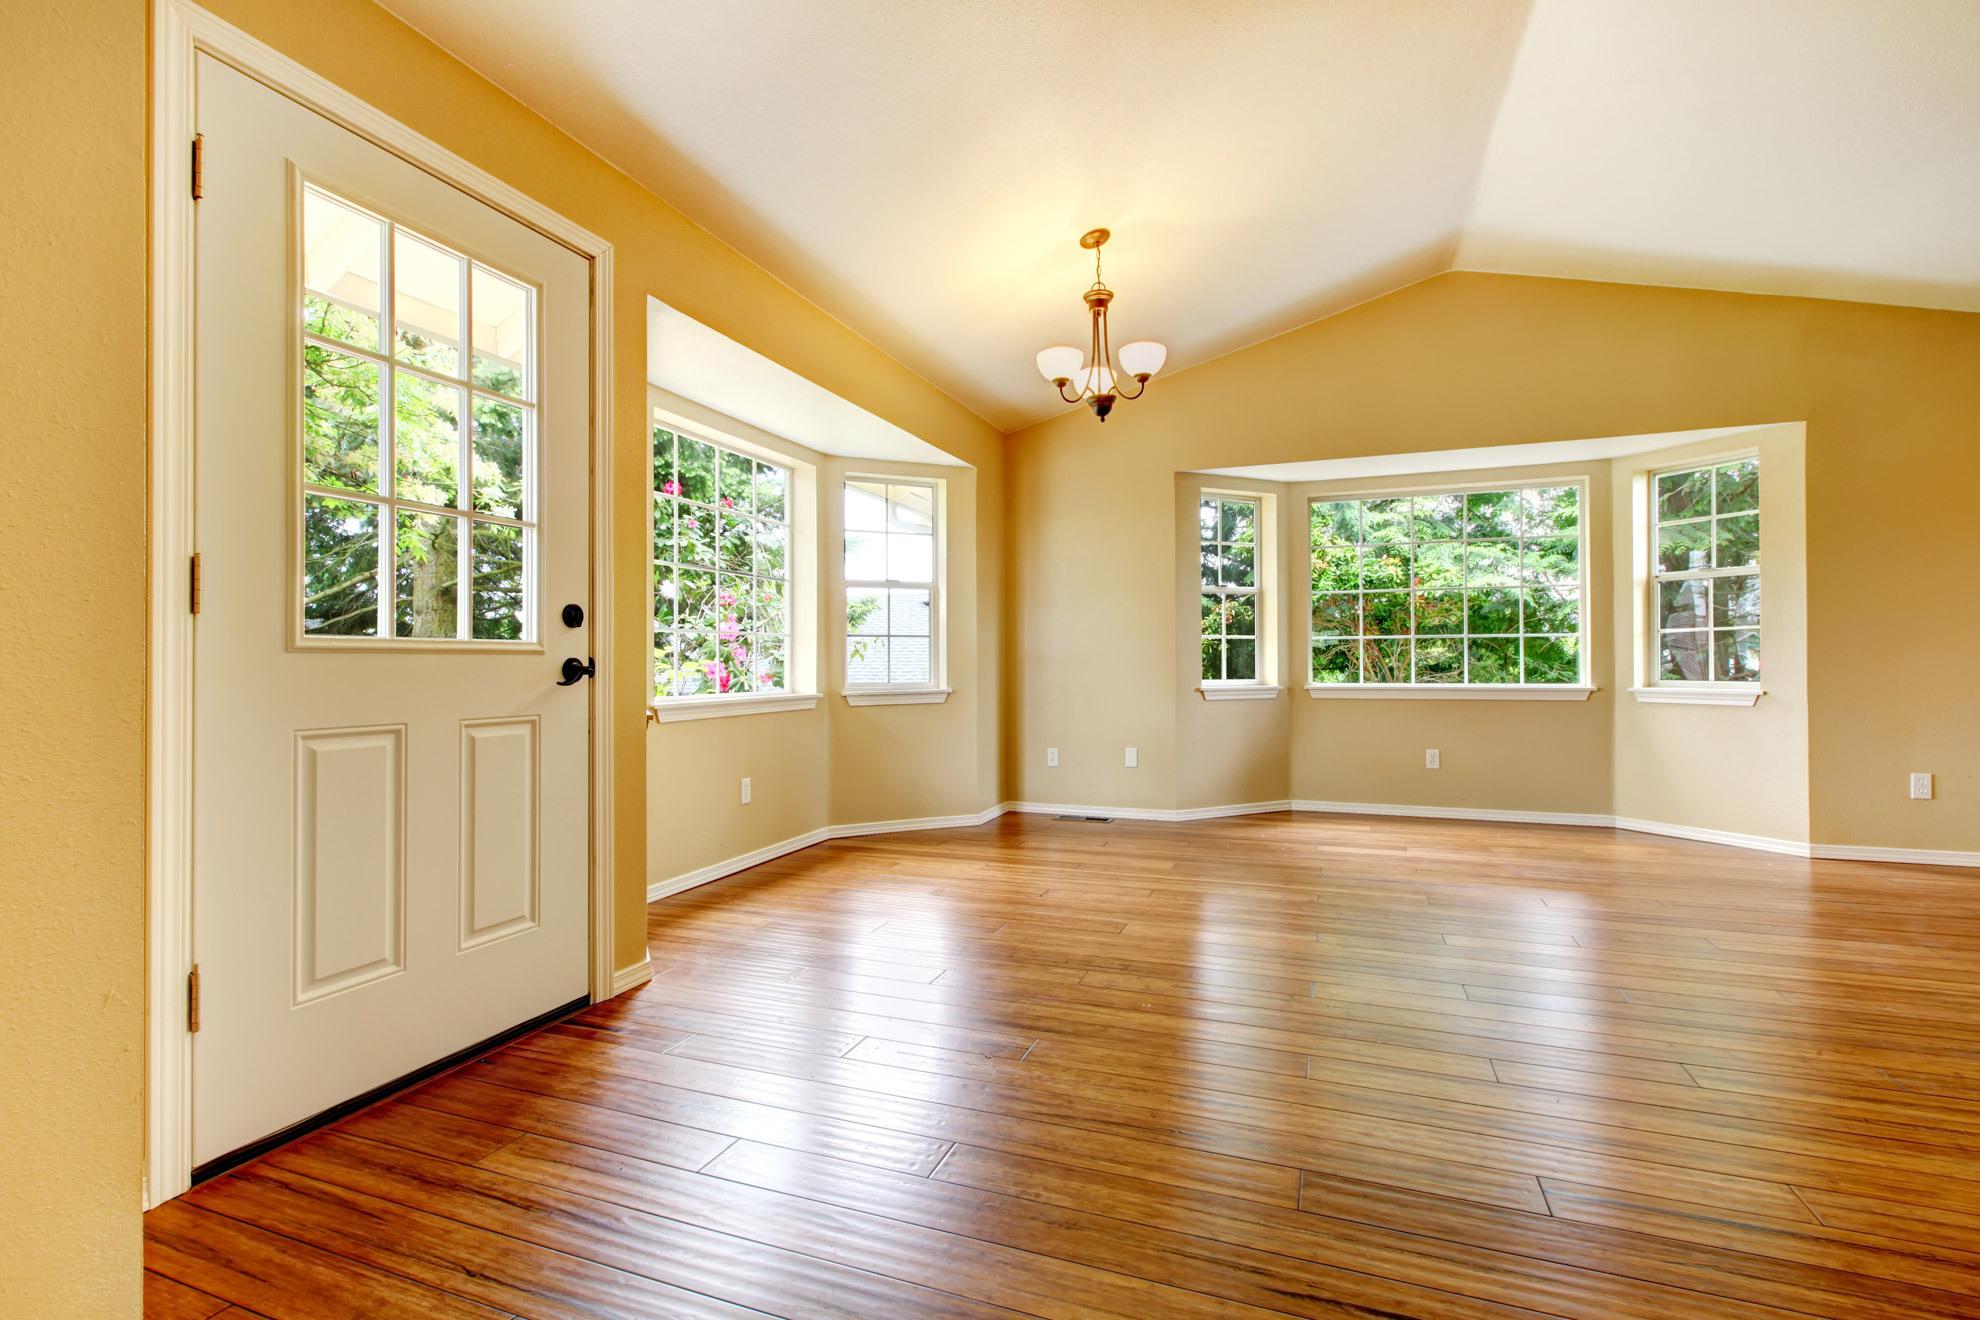 Quality house floor sand service